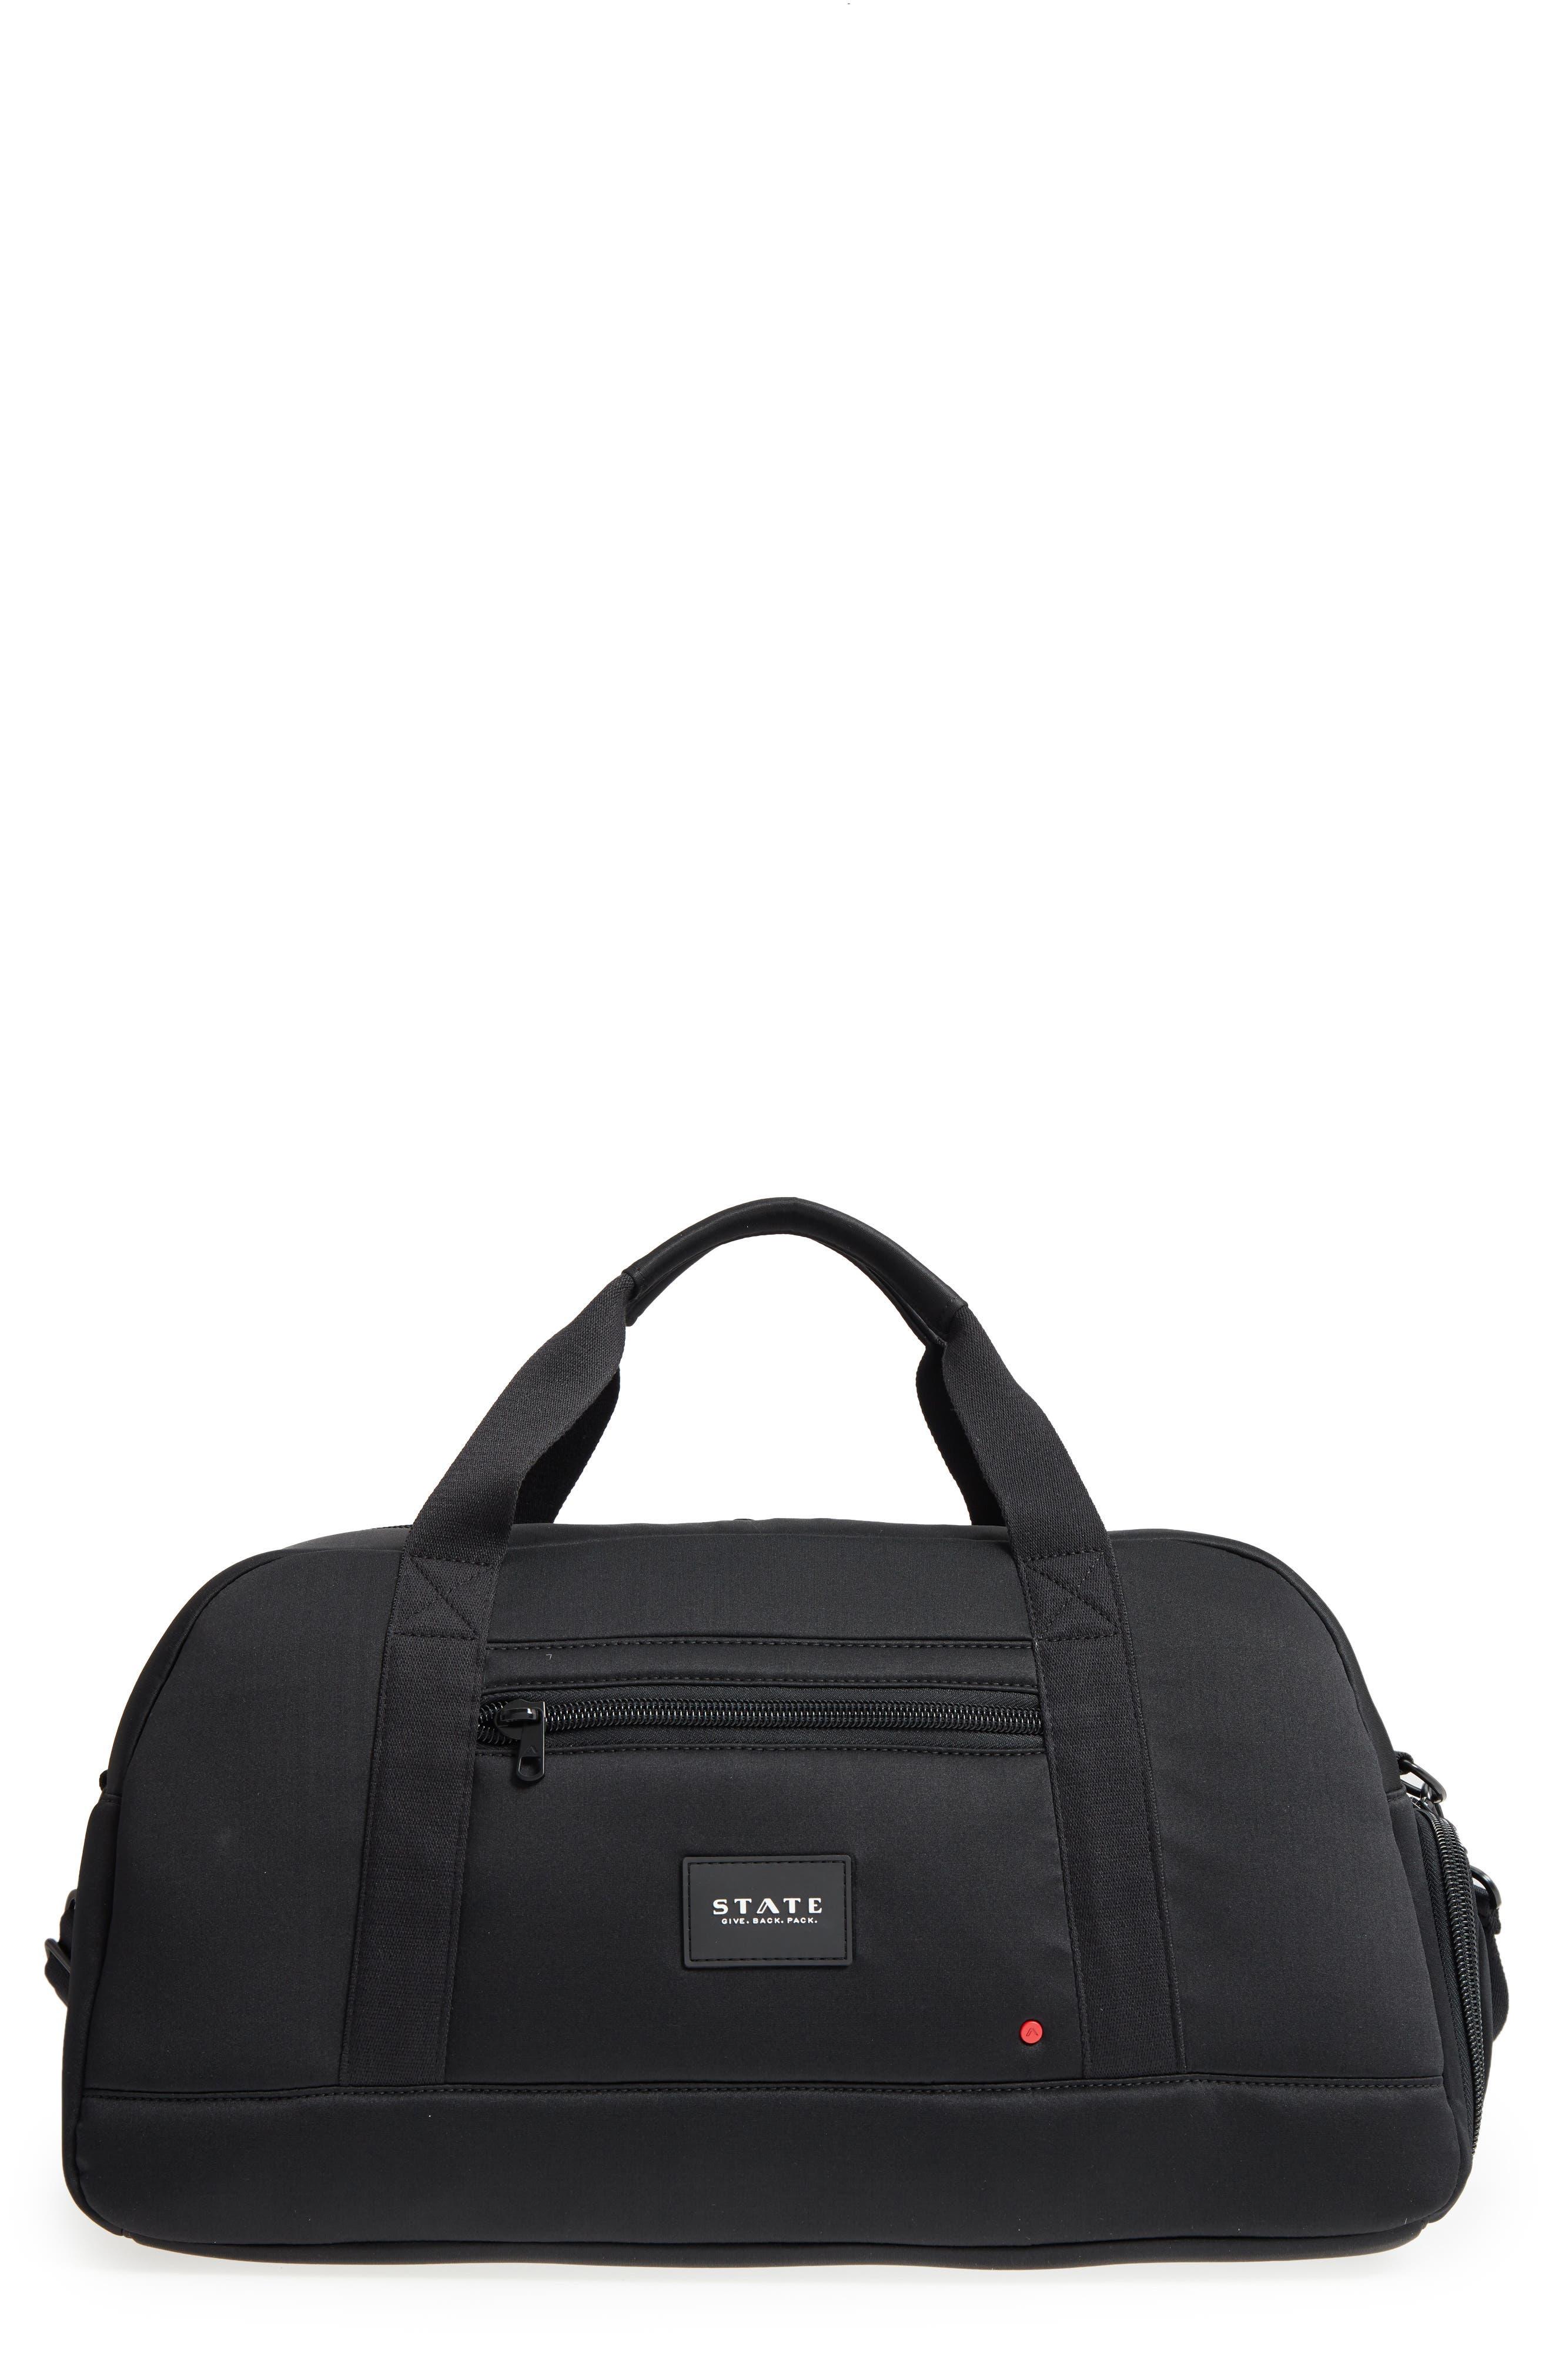 Franklin Neoprene Duffel Bag,                         Main,                         color, Black